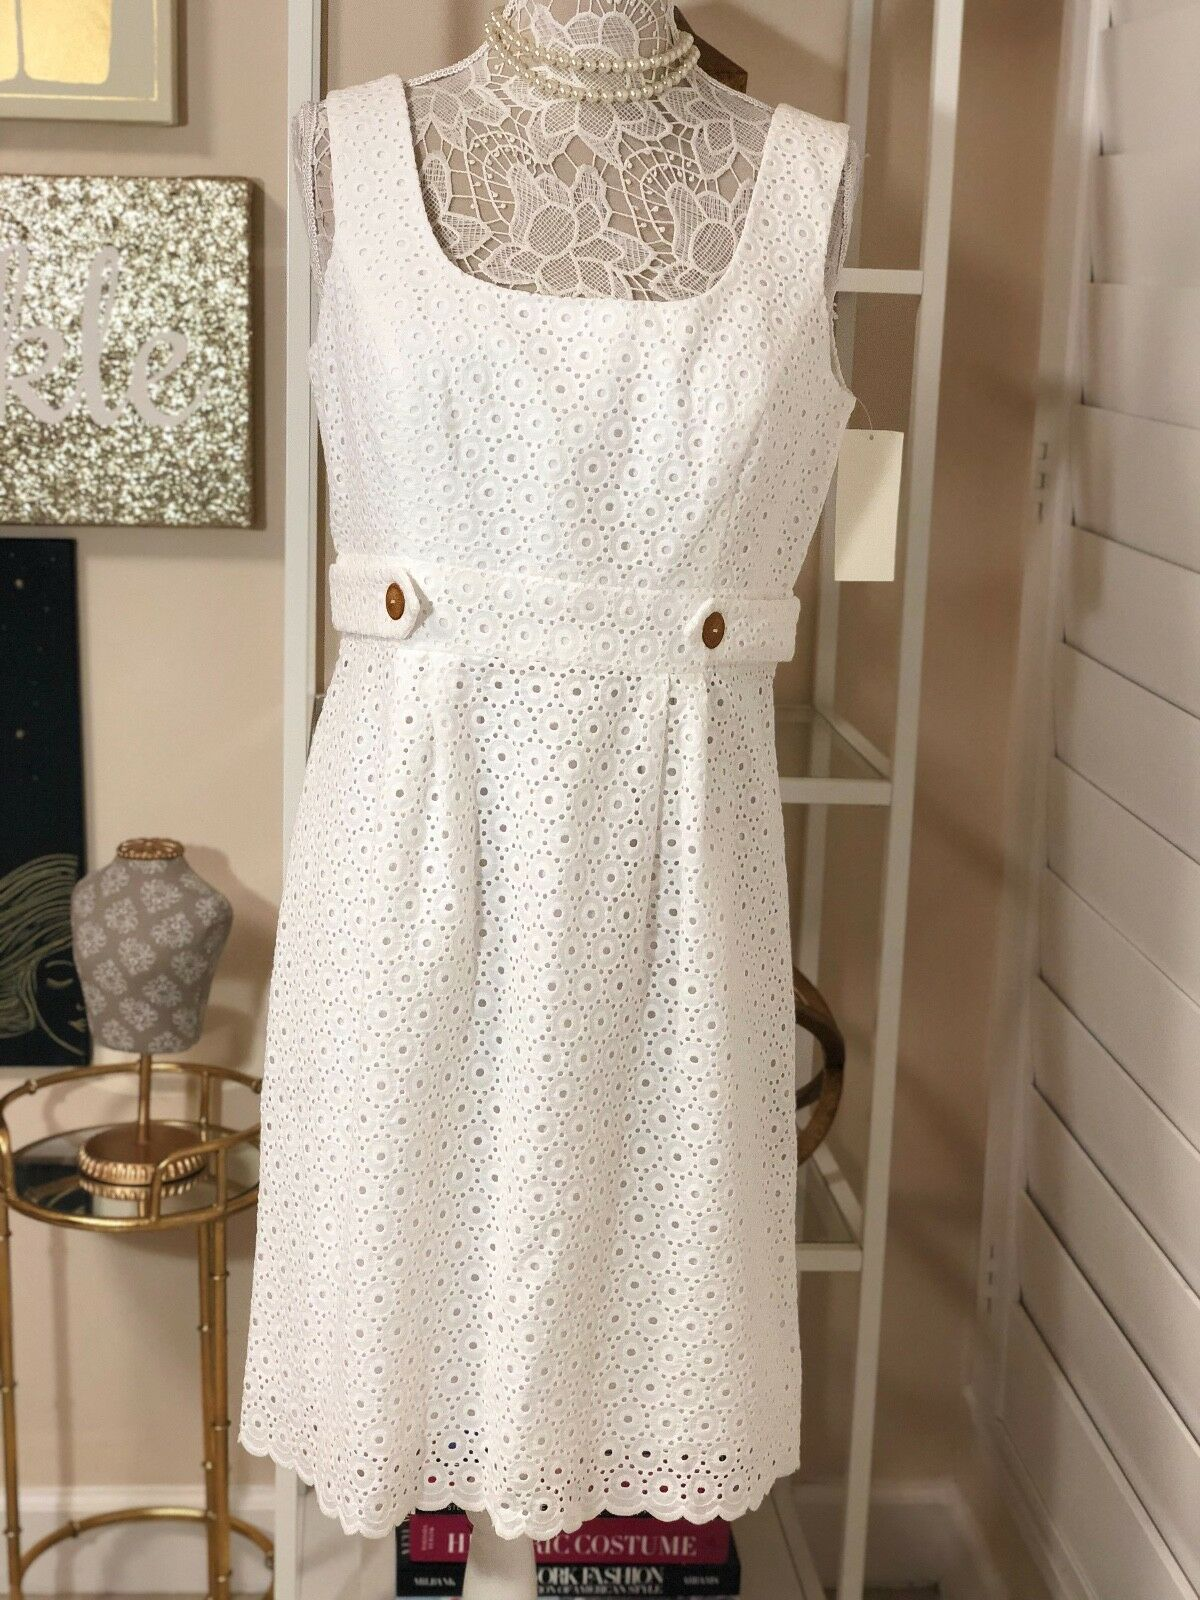 NWT Shoshanna Sand Dollar Eyelet Dress in Natural, Weiß, Sz 12, MSRP